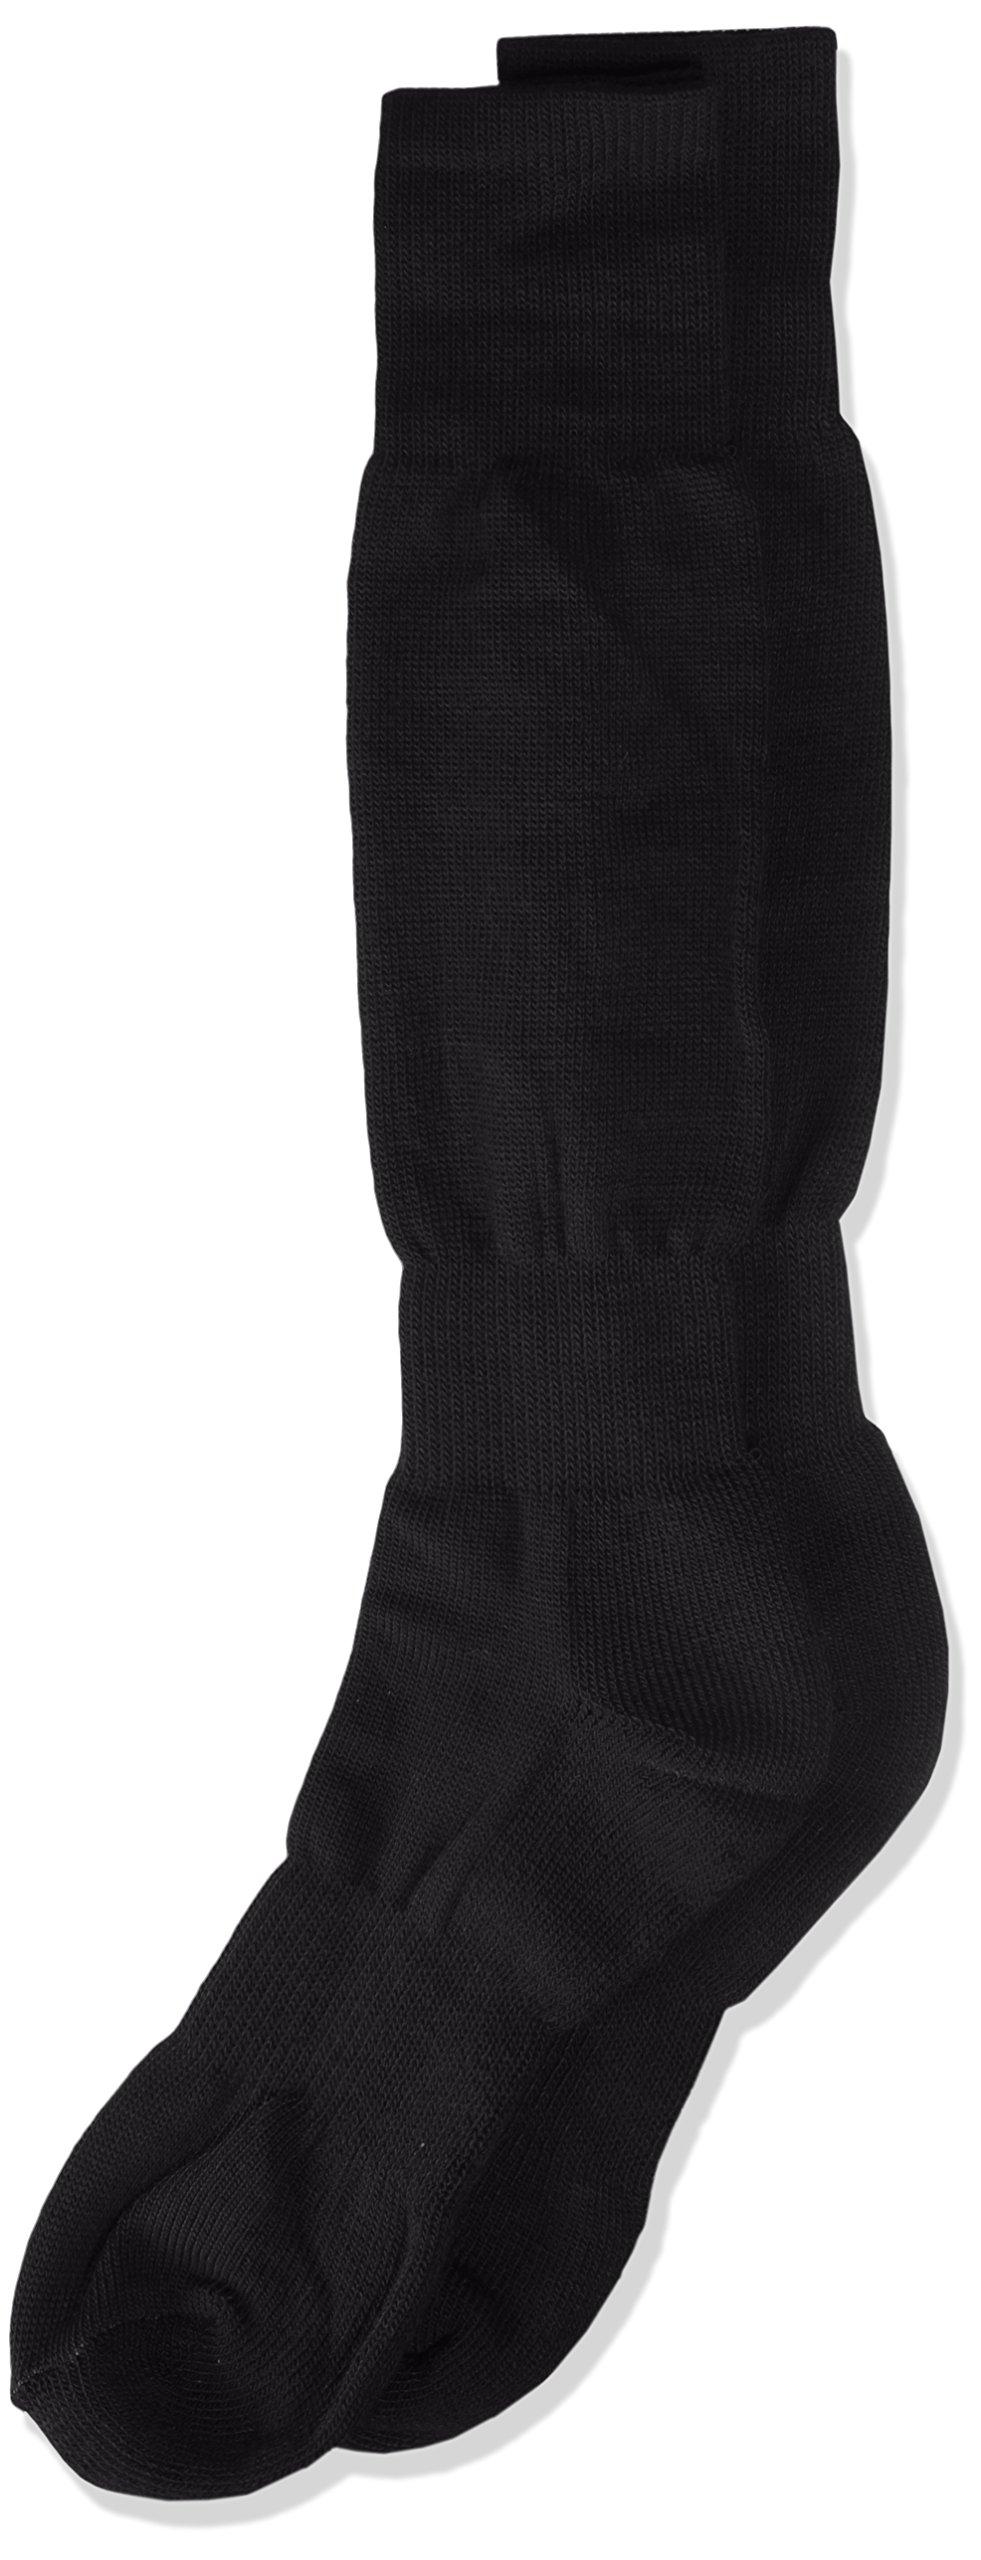 Varsity H/T Baseball Socks, Black, Size 10-13 by TCK